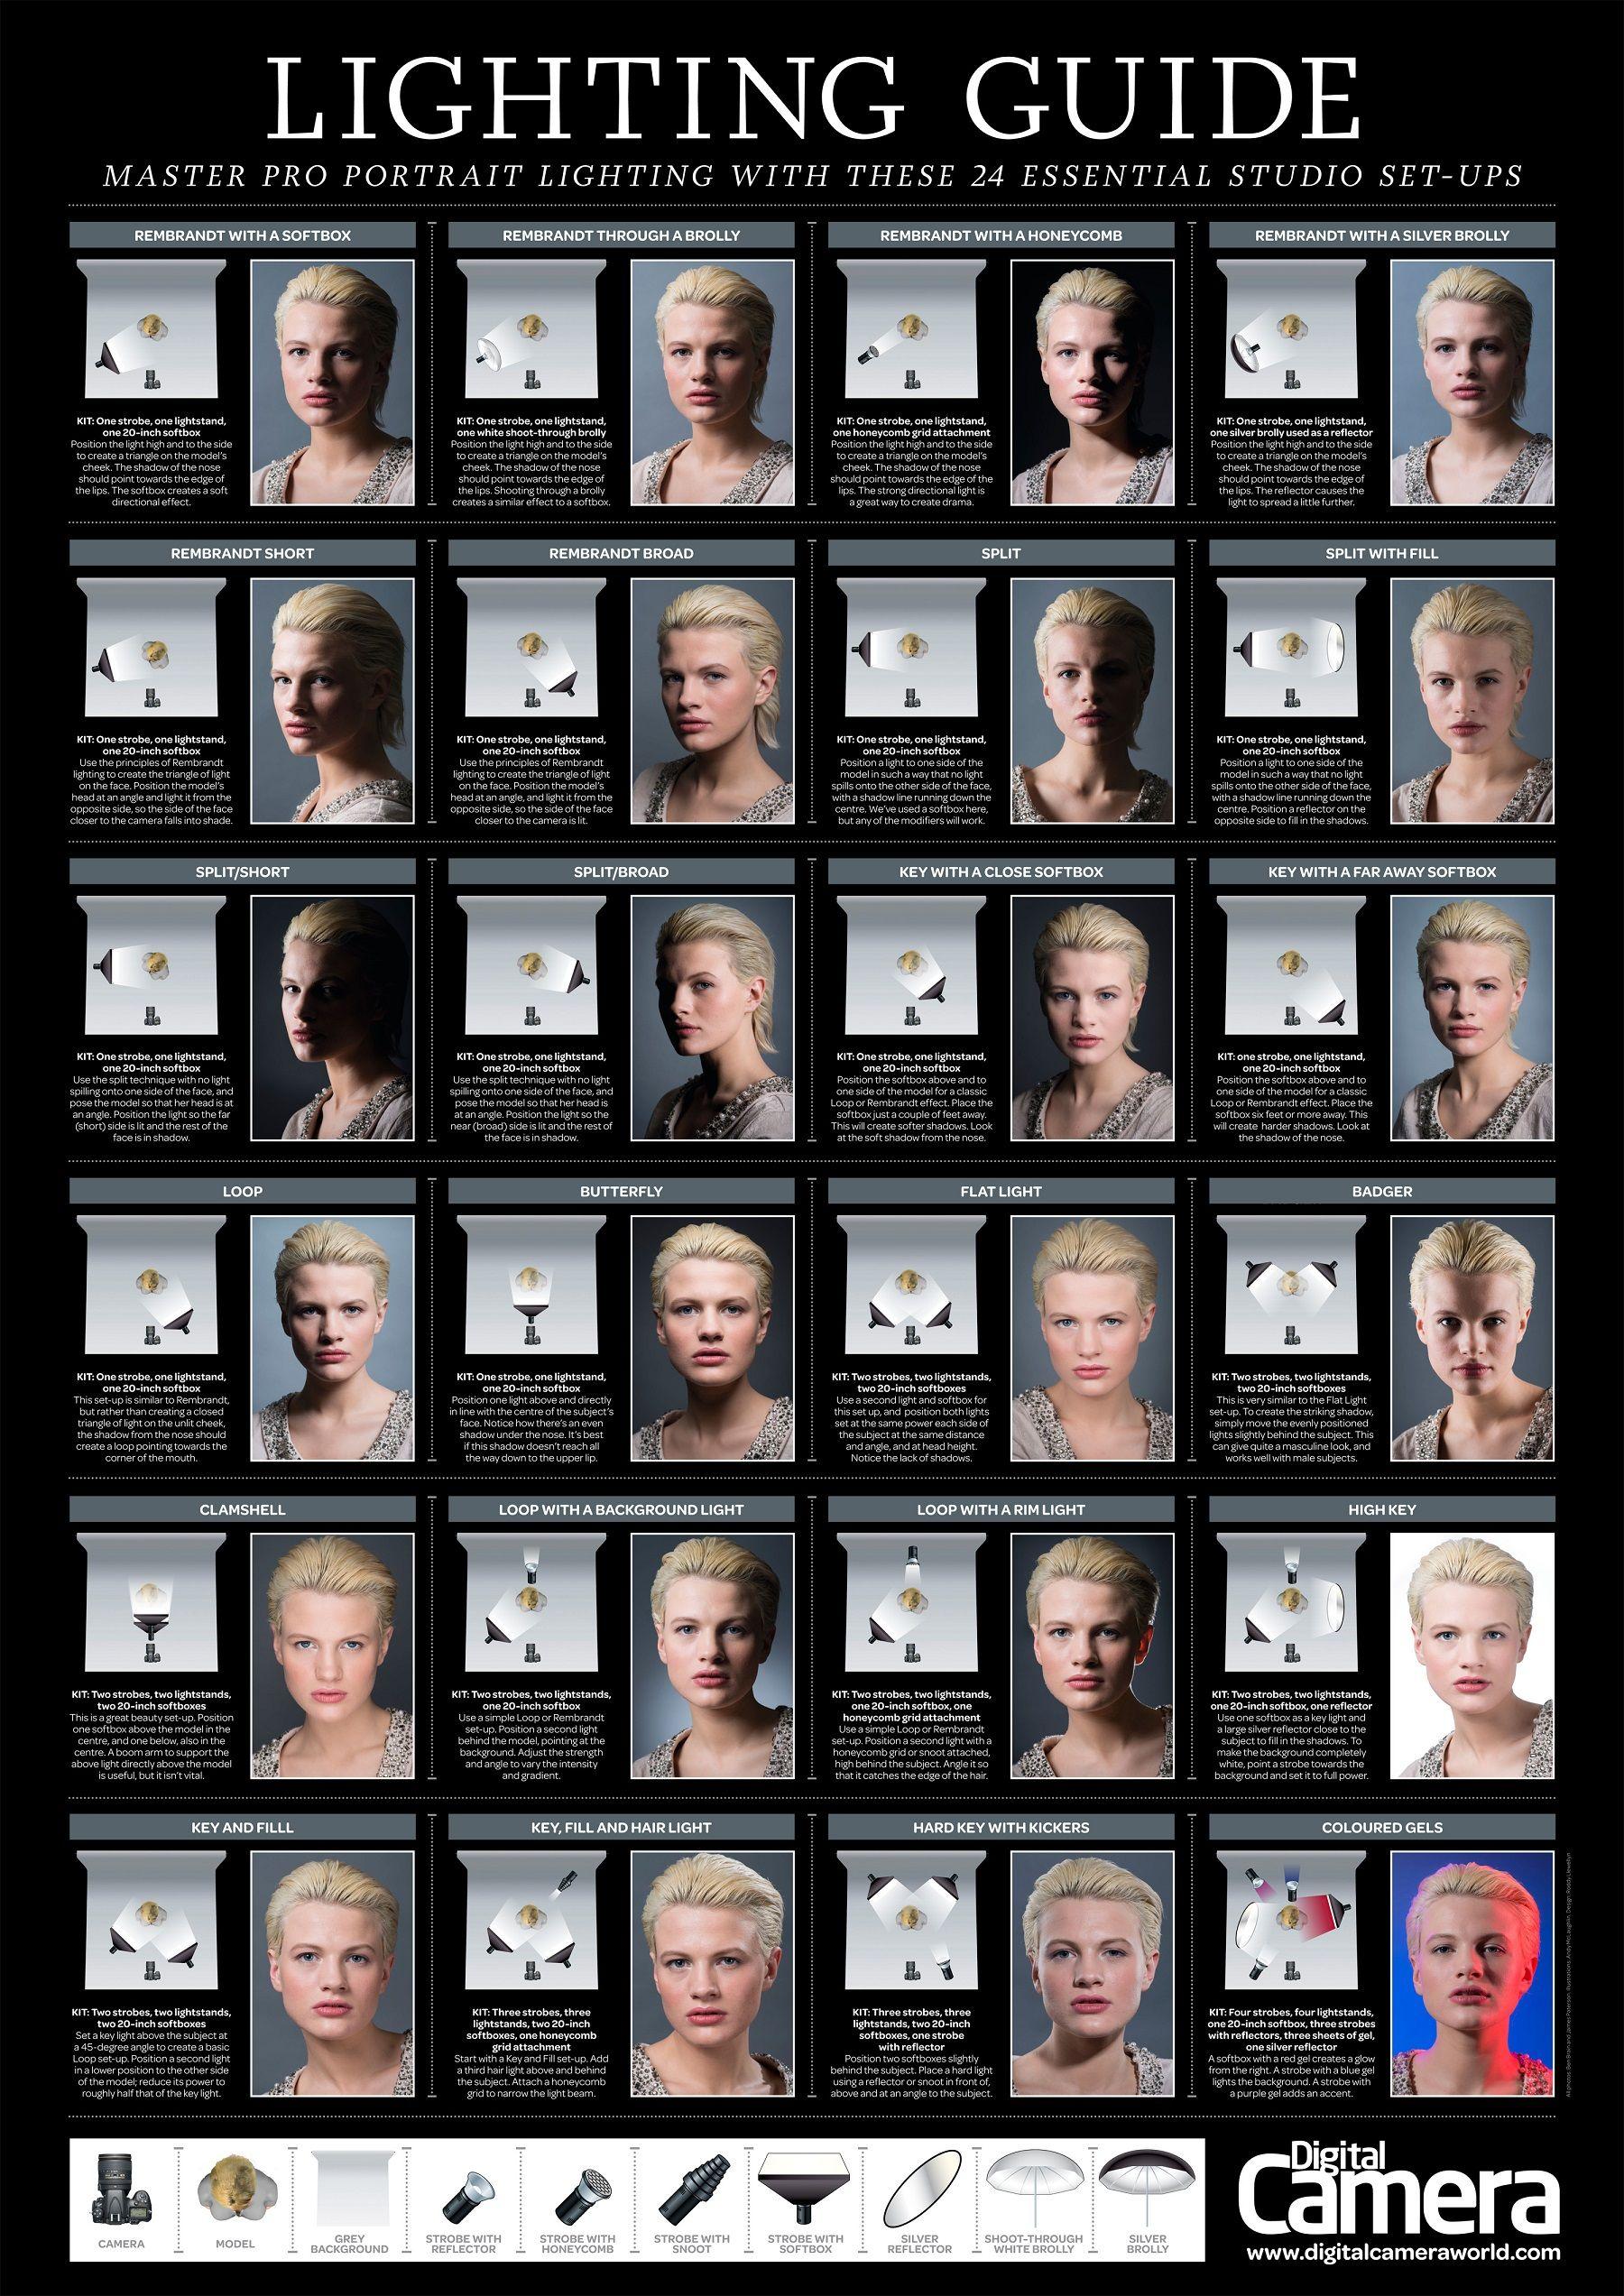 6 Portrait Lighting Patterns Every Photographer Should Know   Essentials Portraits and Portrait lighting setup  sc 1 st  Pinterest & 6 Portrait Lighting Patterns Every Photographer Should Know ... azcodes.com